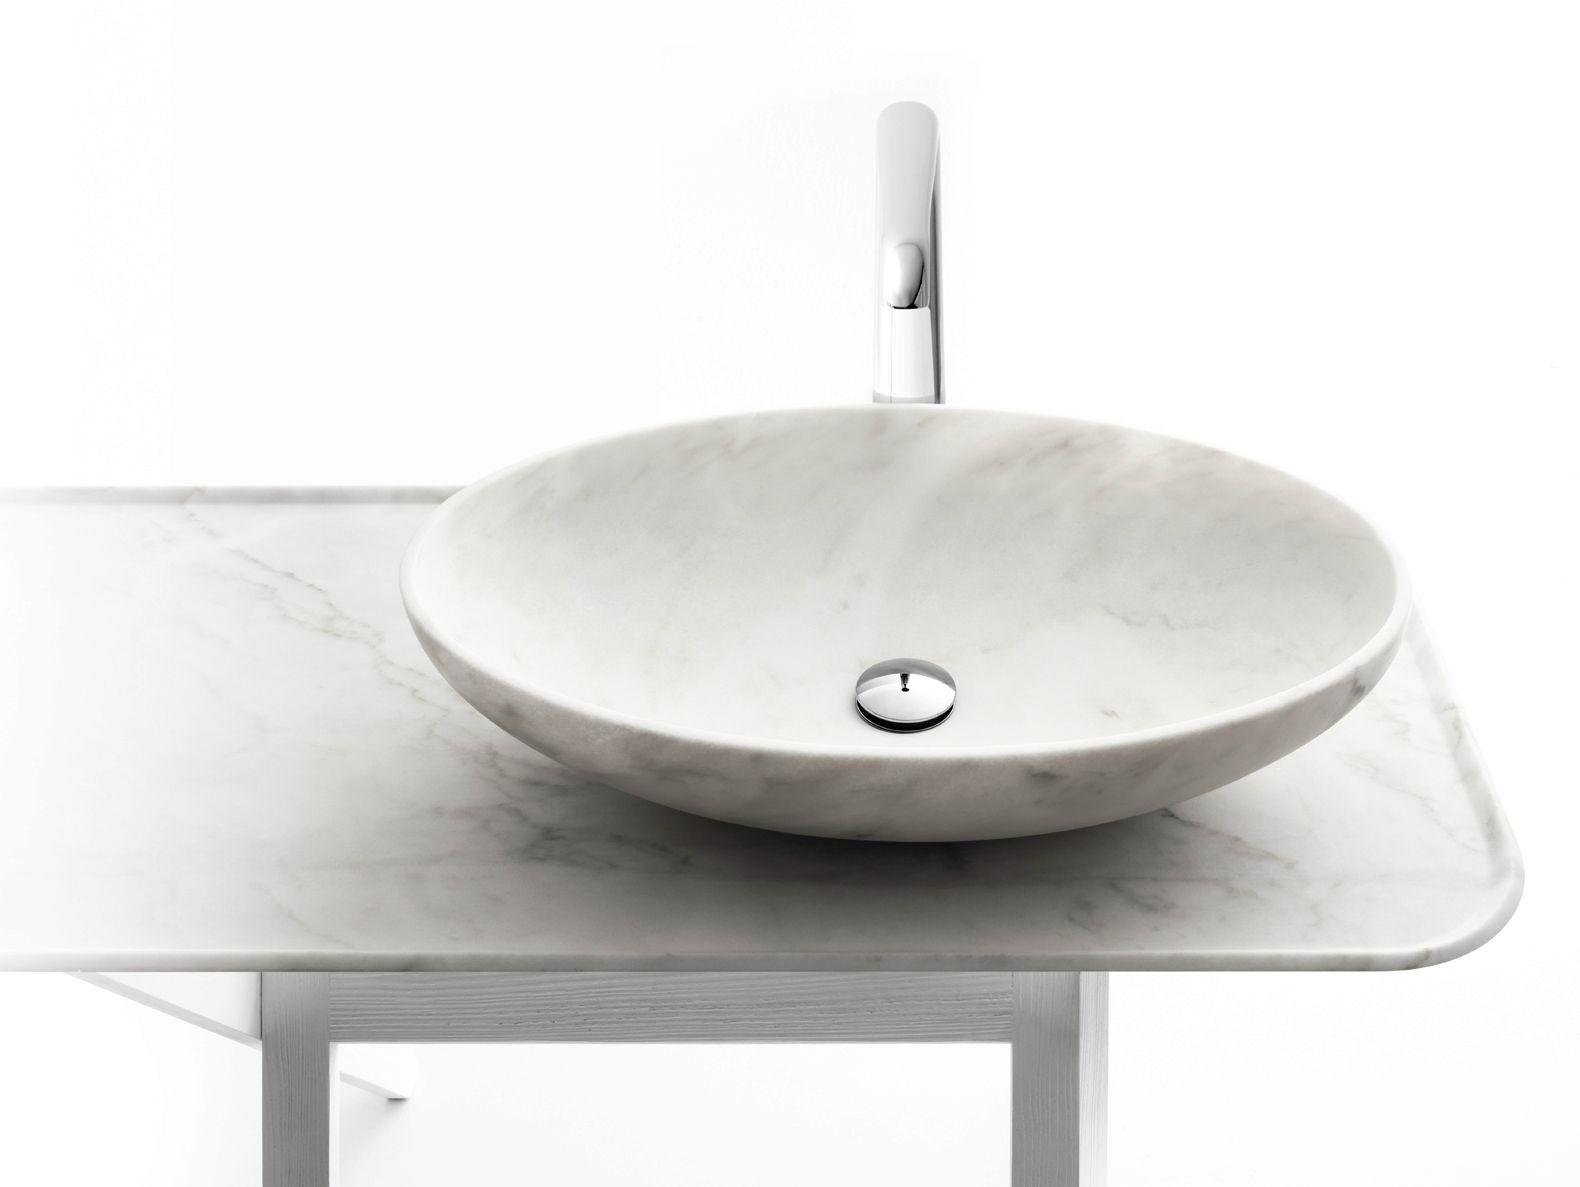 Countertop marble washbasin BOWL N10 Nabhi Collection by Kreoo   design  Enzo Berti